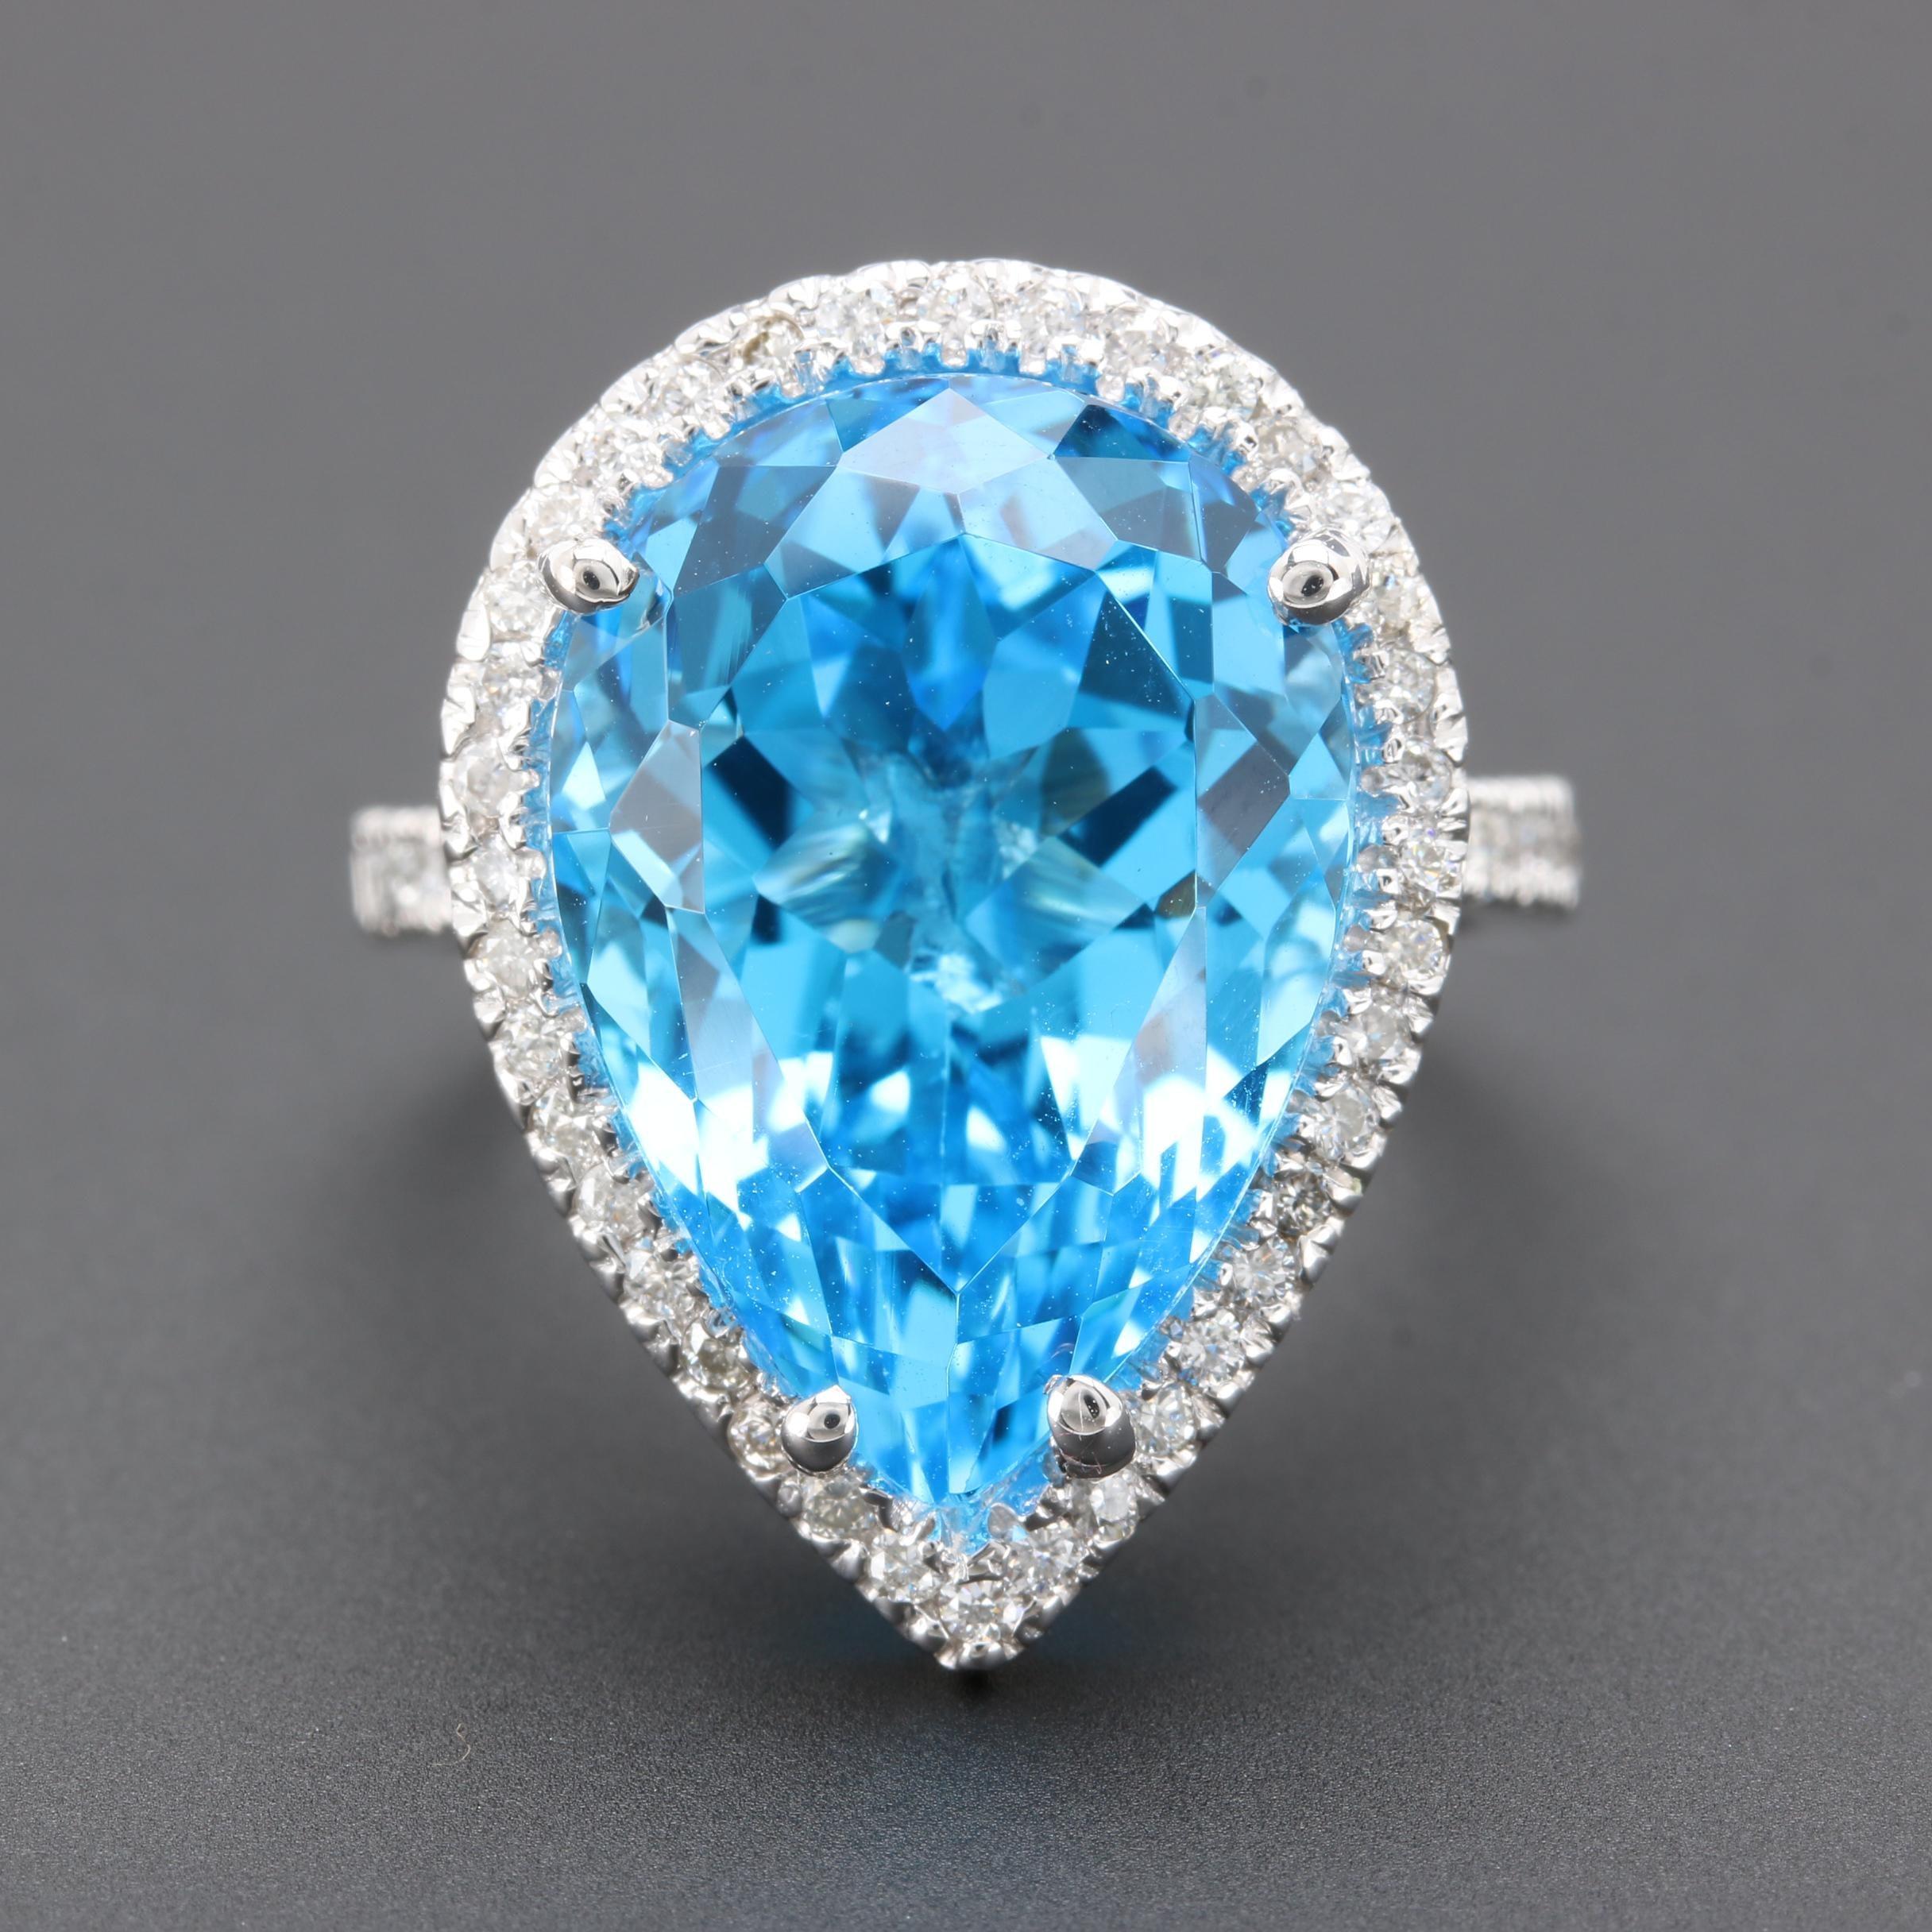 14K White Gold 15.50 CT Blue Topaz and Diamond Ring